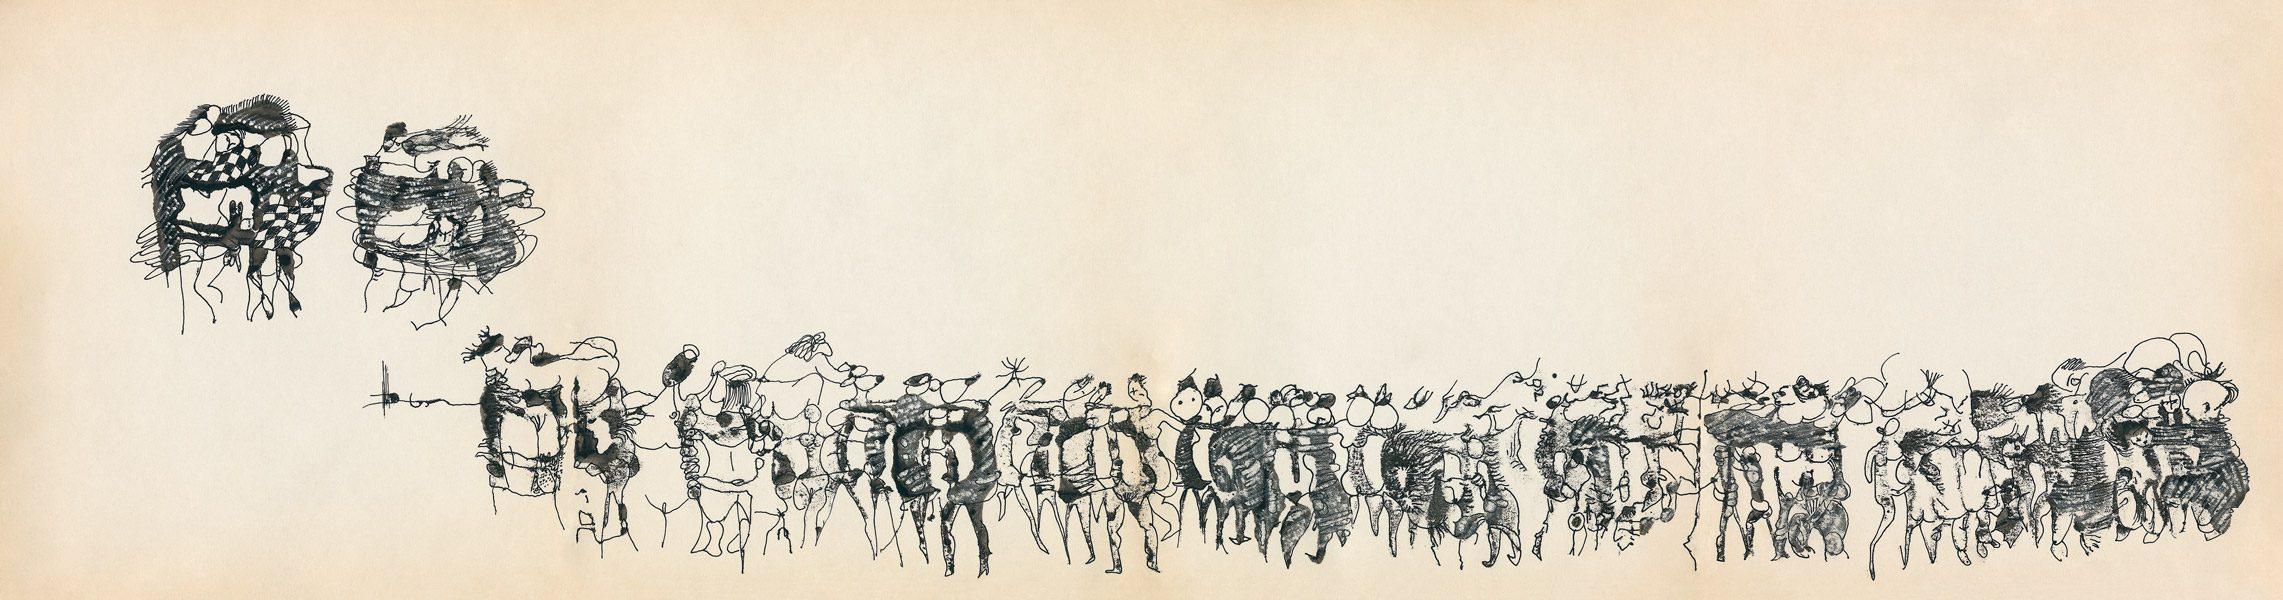 "LEBADANG, ""Genesis_28_29_30_31"", circa 1960, encre de Chine sur papier, 16.8 x 16.3 cm. © Myshu Lebadang, Paris, France."